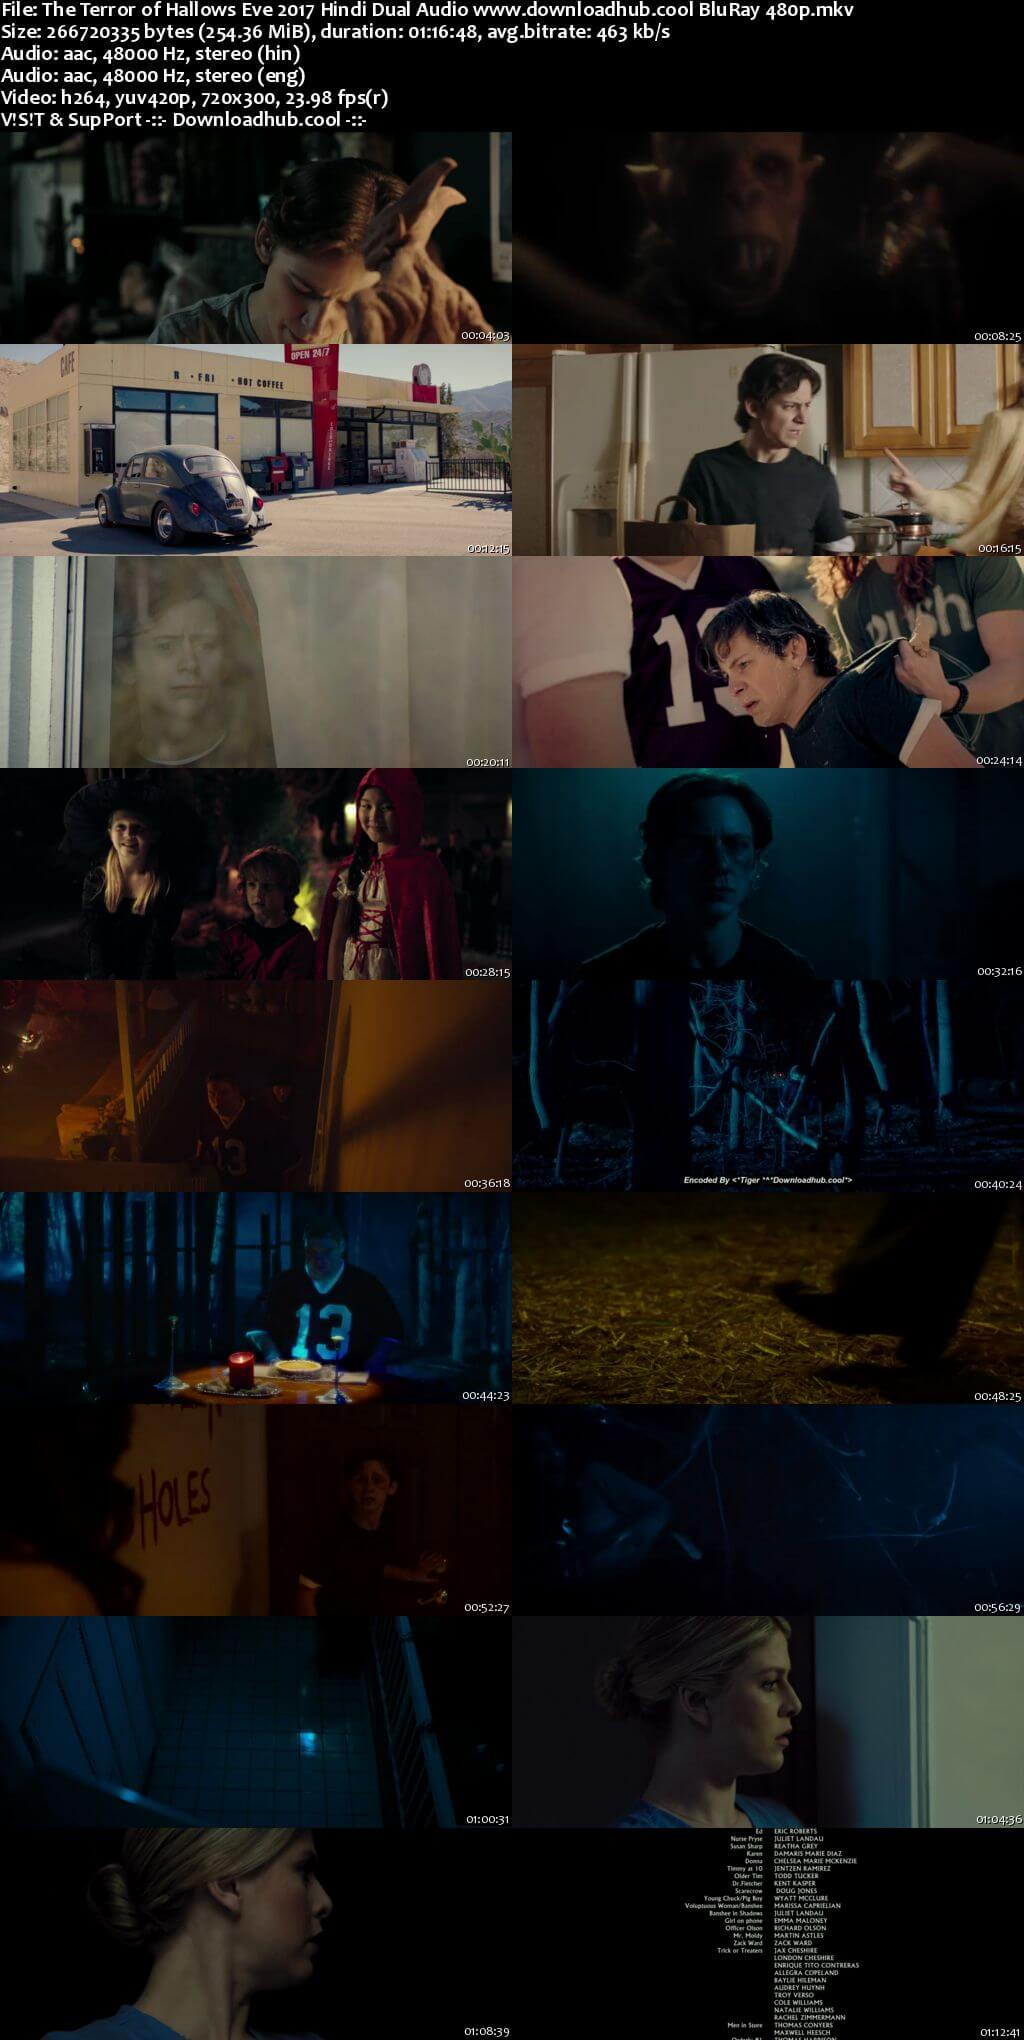 The Terror of Hallows Eve 2017 Hindi Dual Audio 250MB BluRay 480p